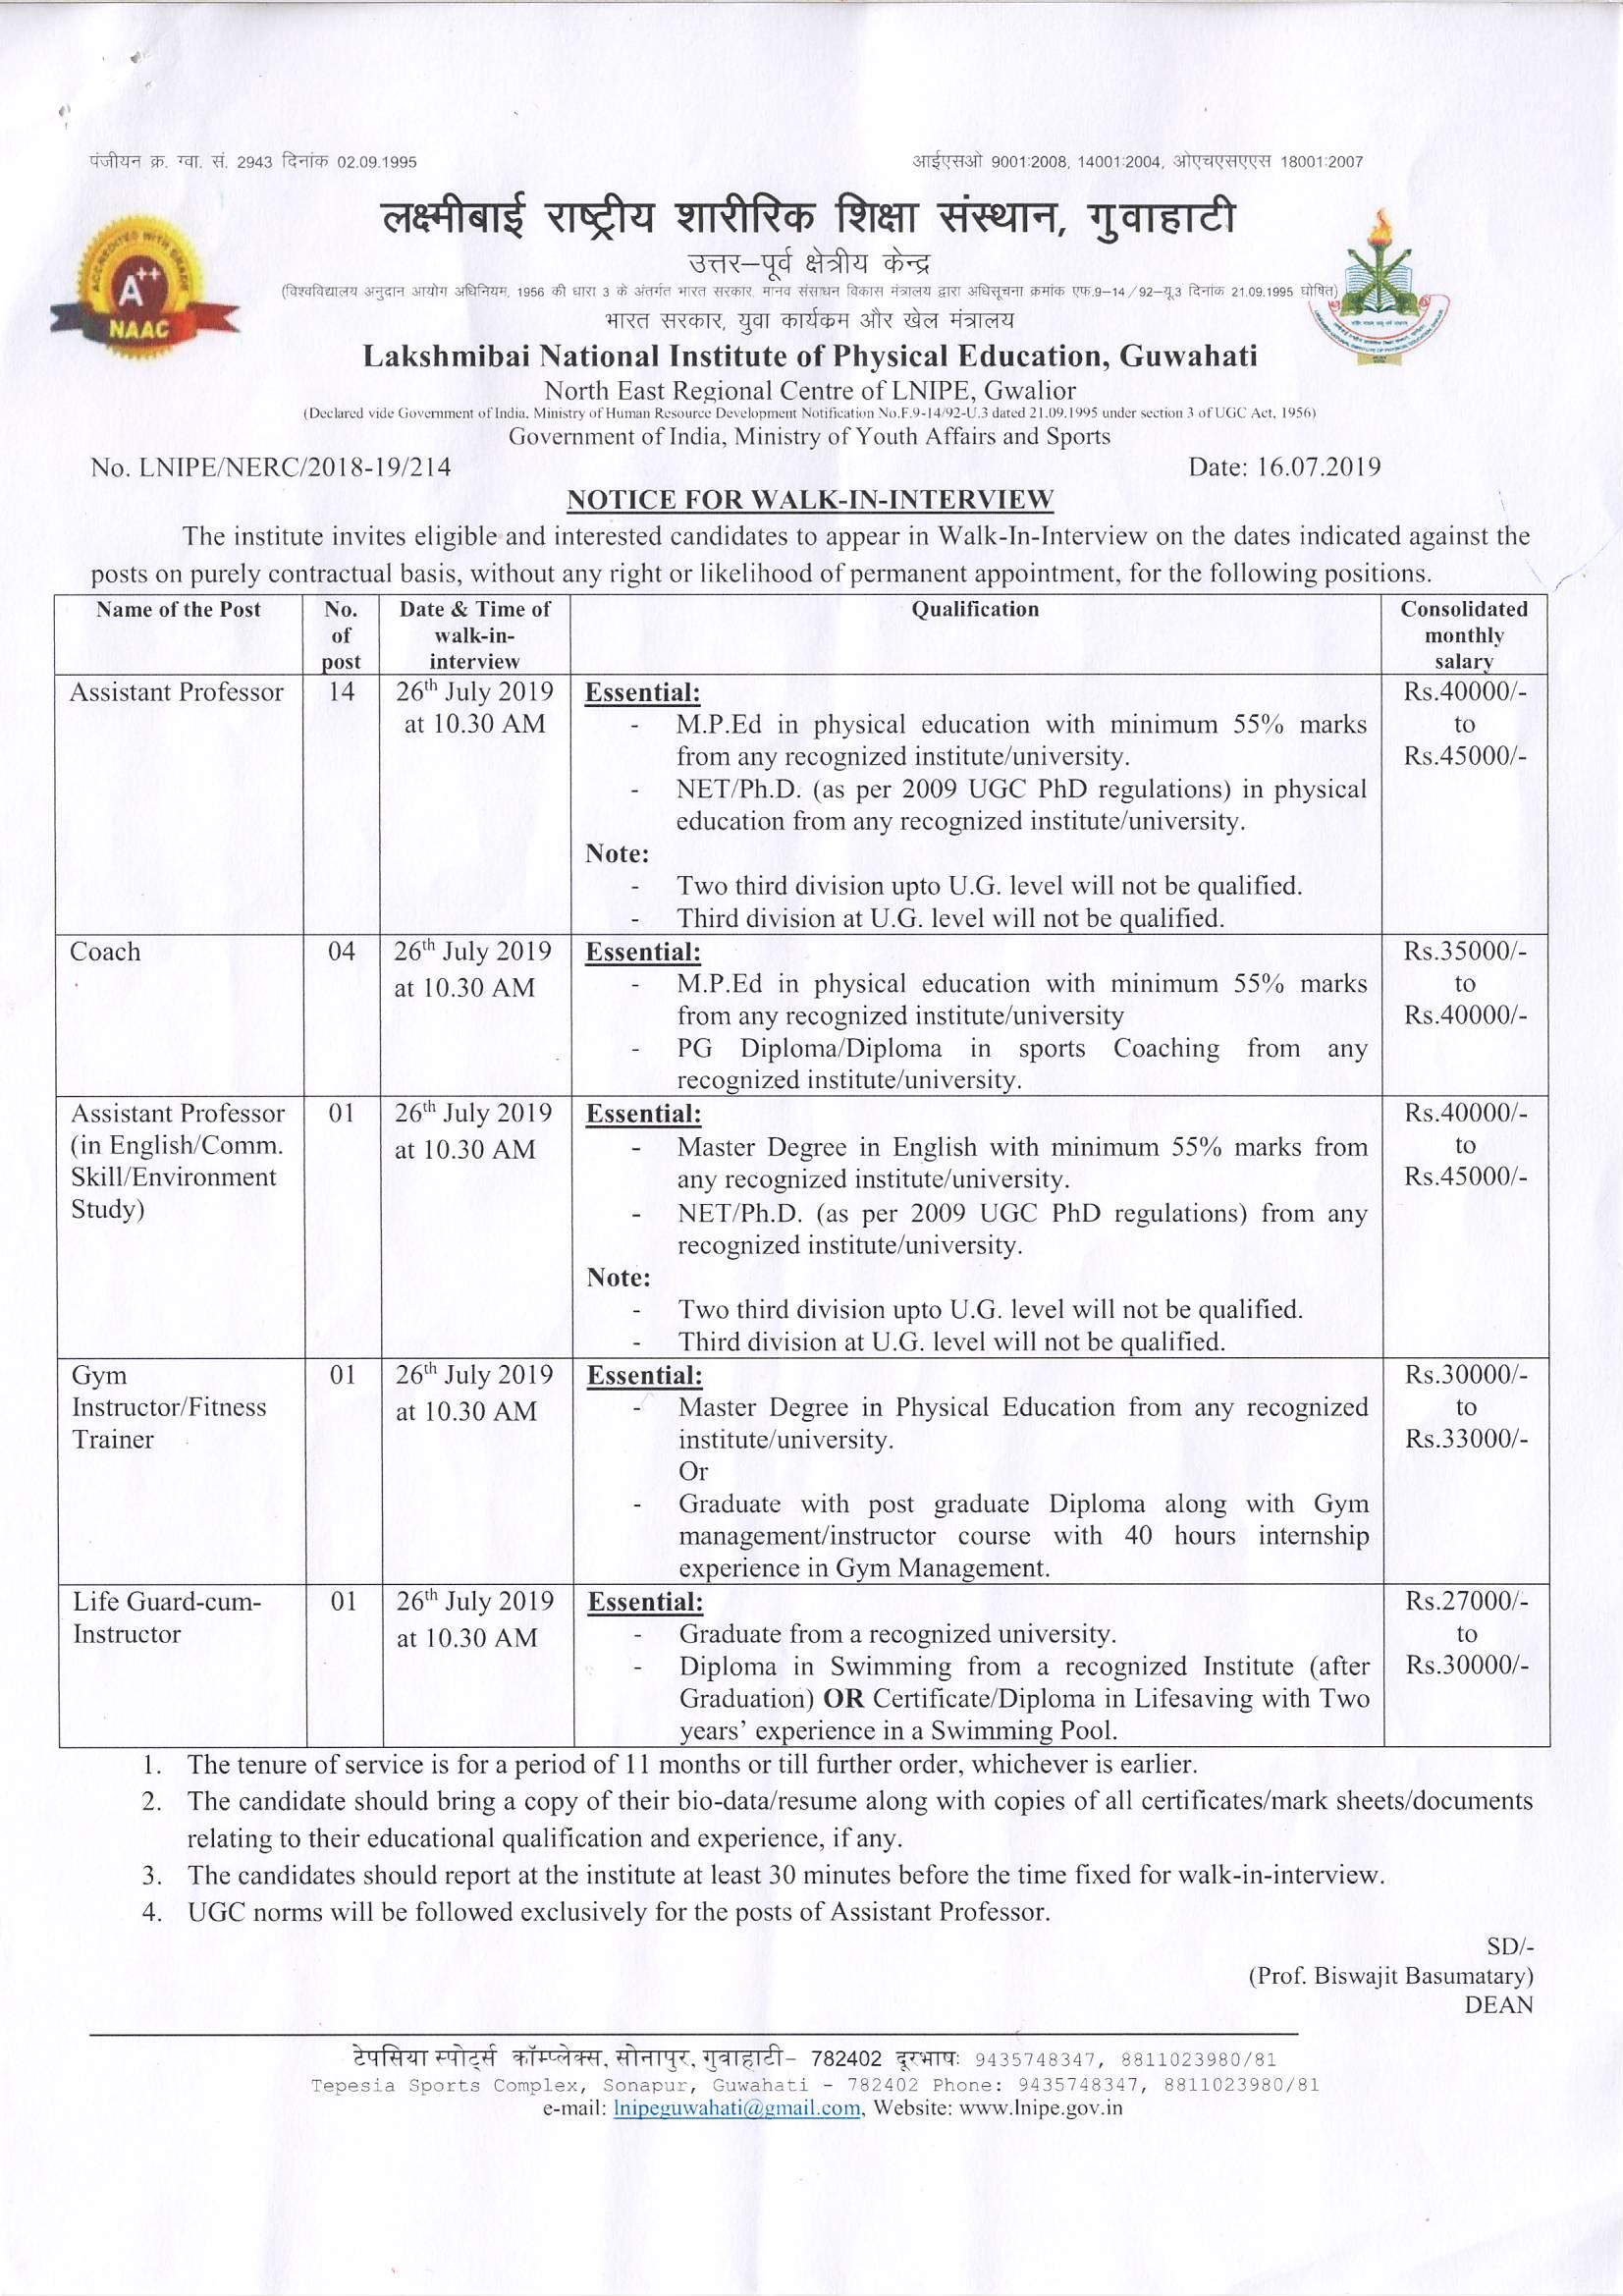 Job Opportunities | लक्ष्मीबाई राष्ट्रीय